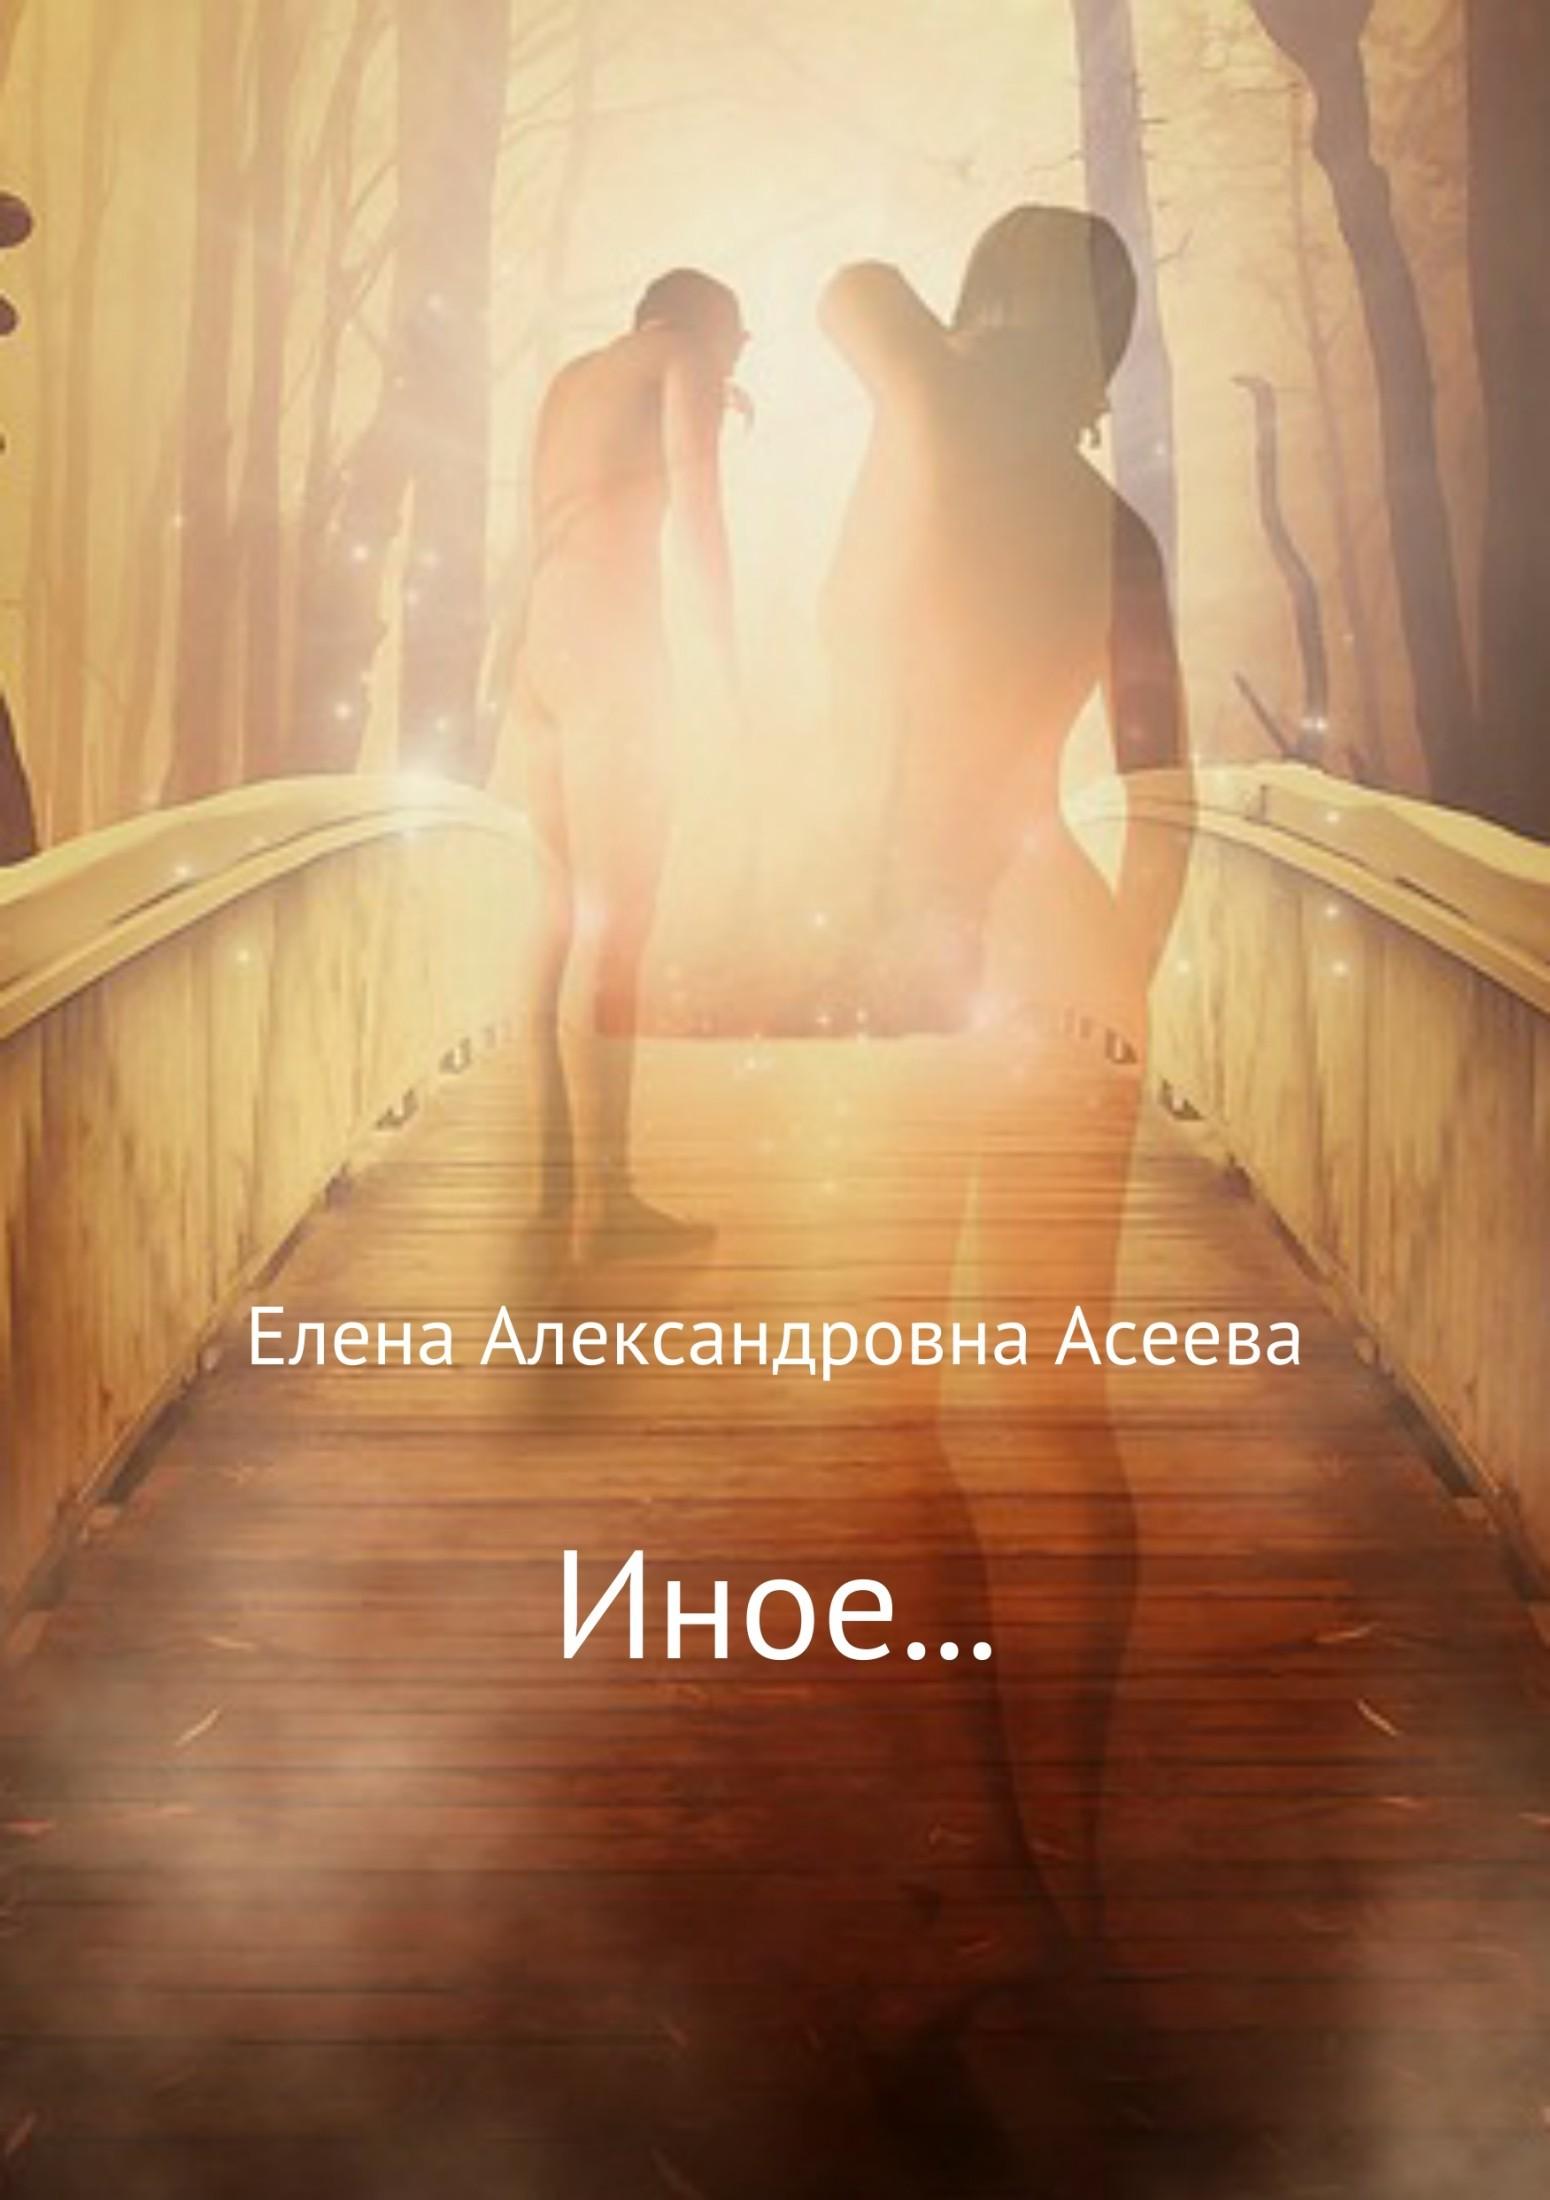 Елена Александровна Асеева Иное… елена александровна асеева коло жизни средина том второй